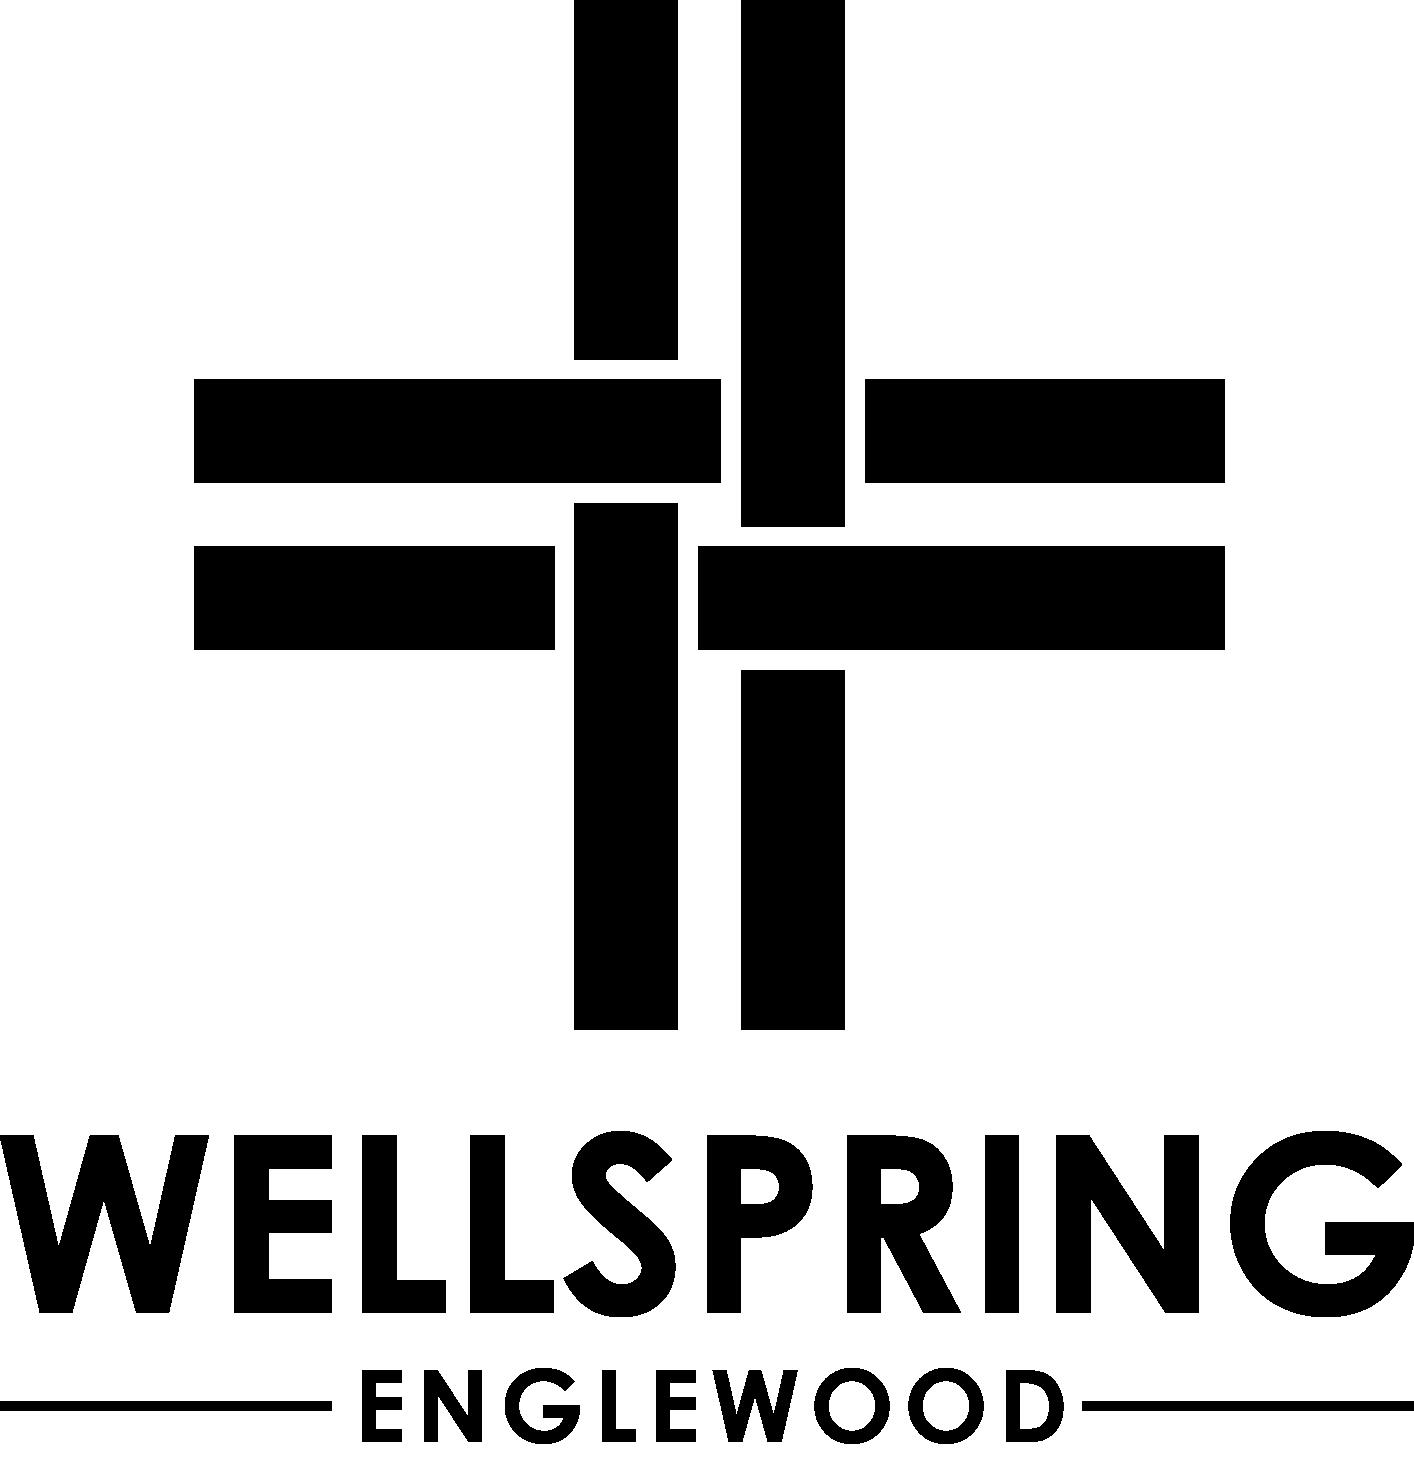 logoenglewoodstackedblackmedium.png